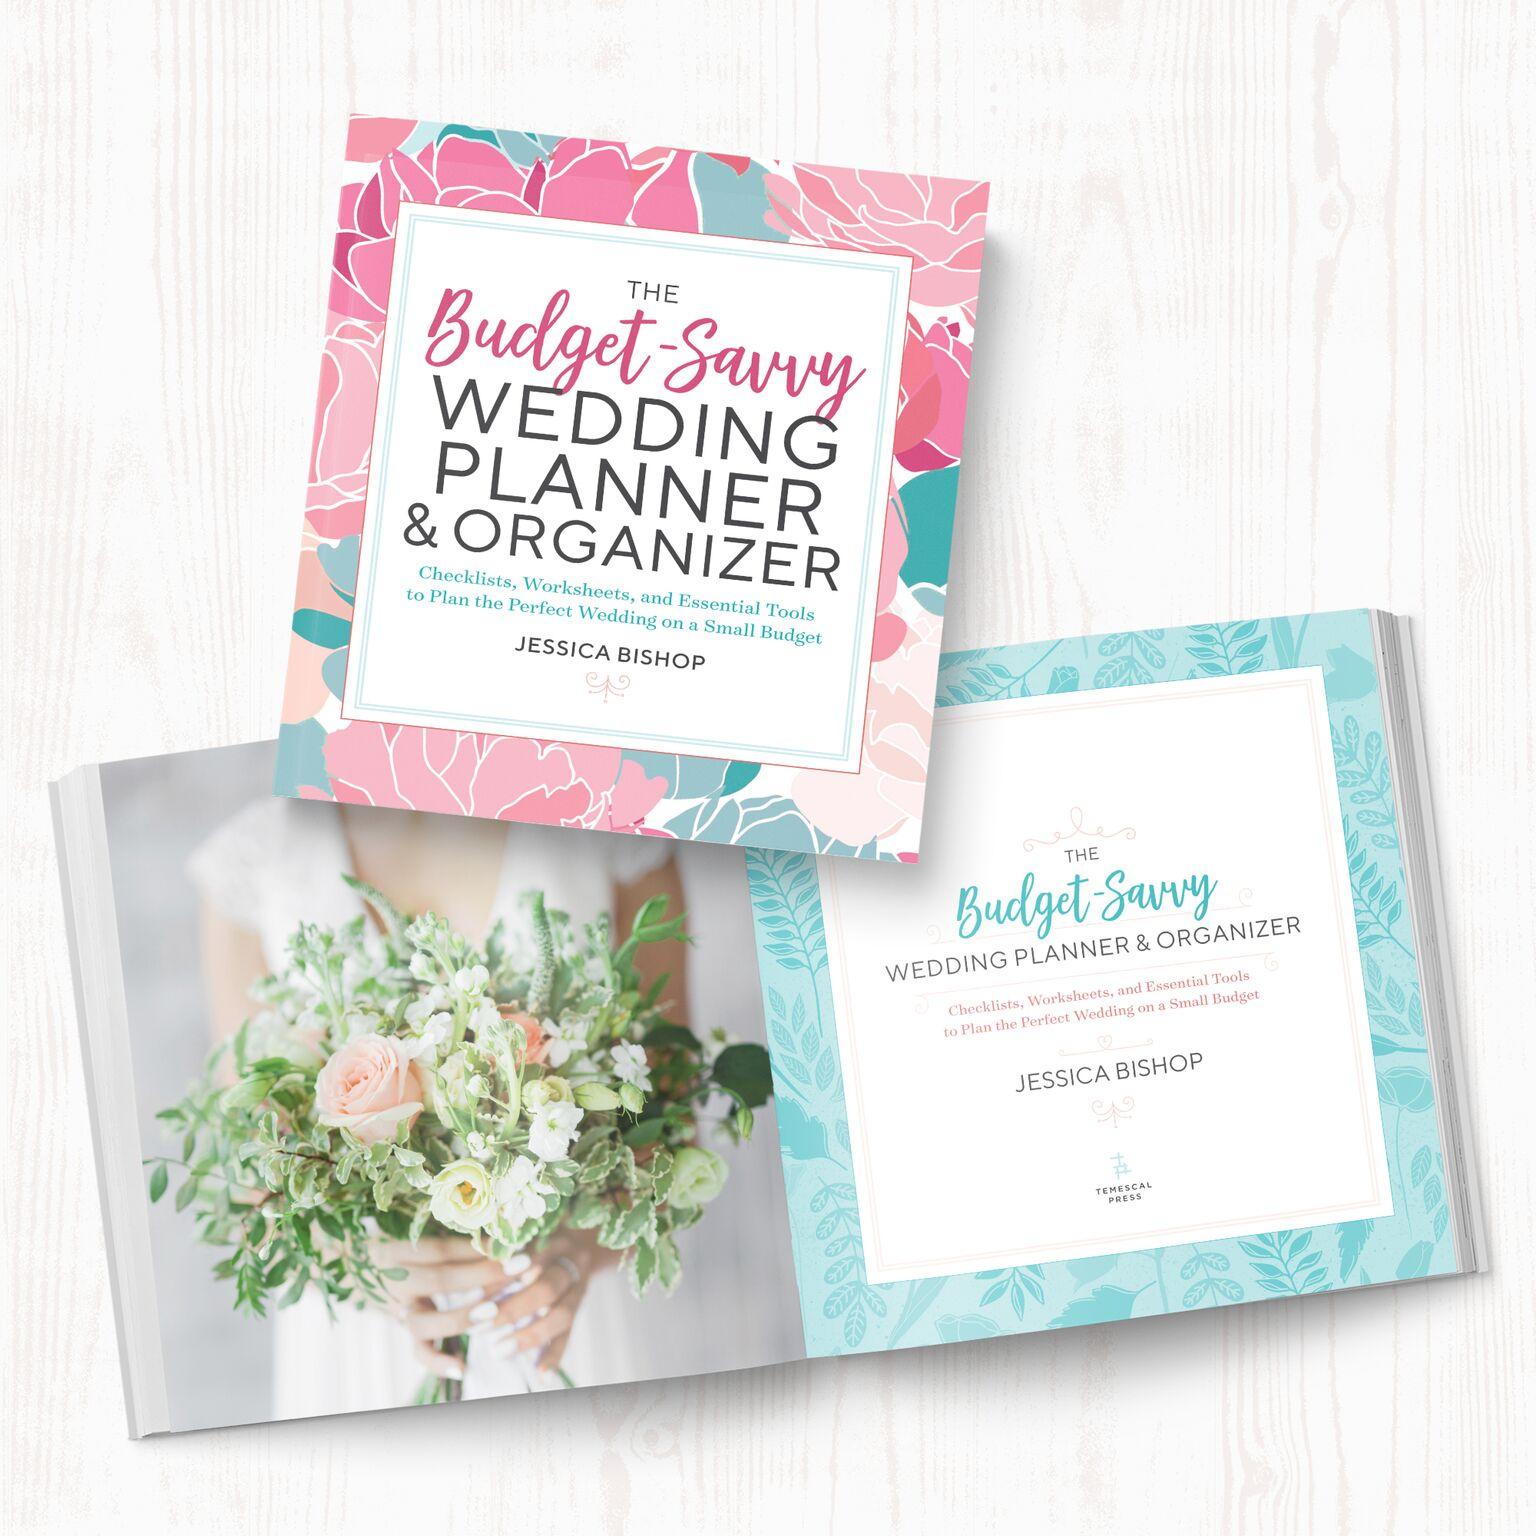 The Budget-Savvy Wedding Planner & Organizer